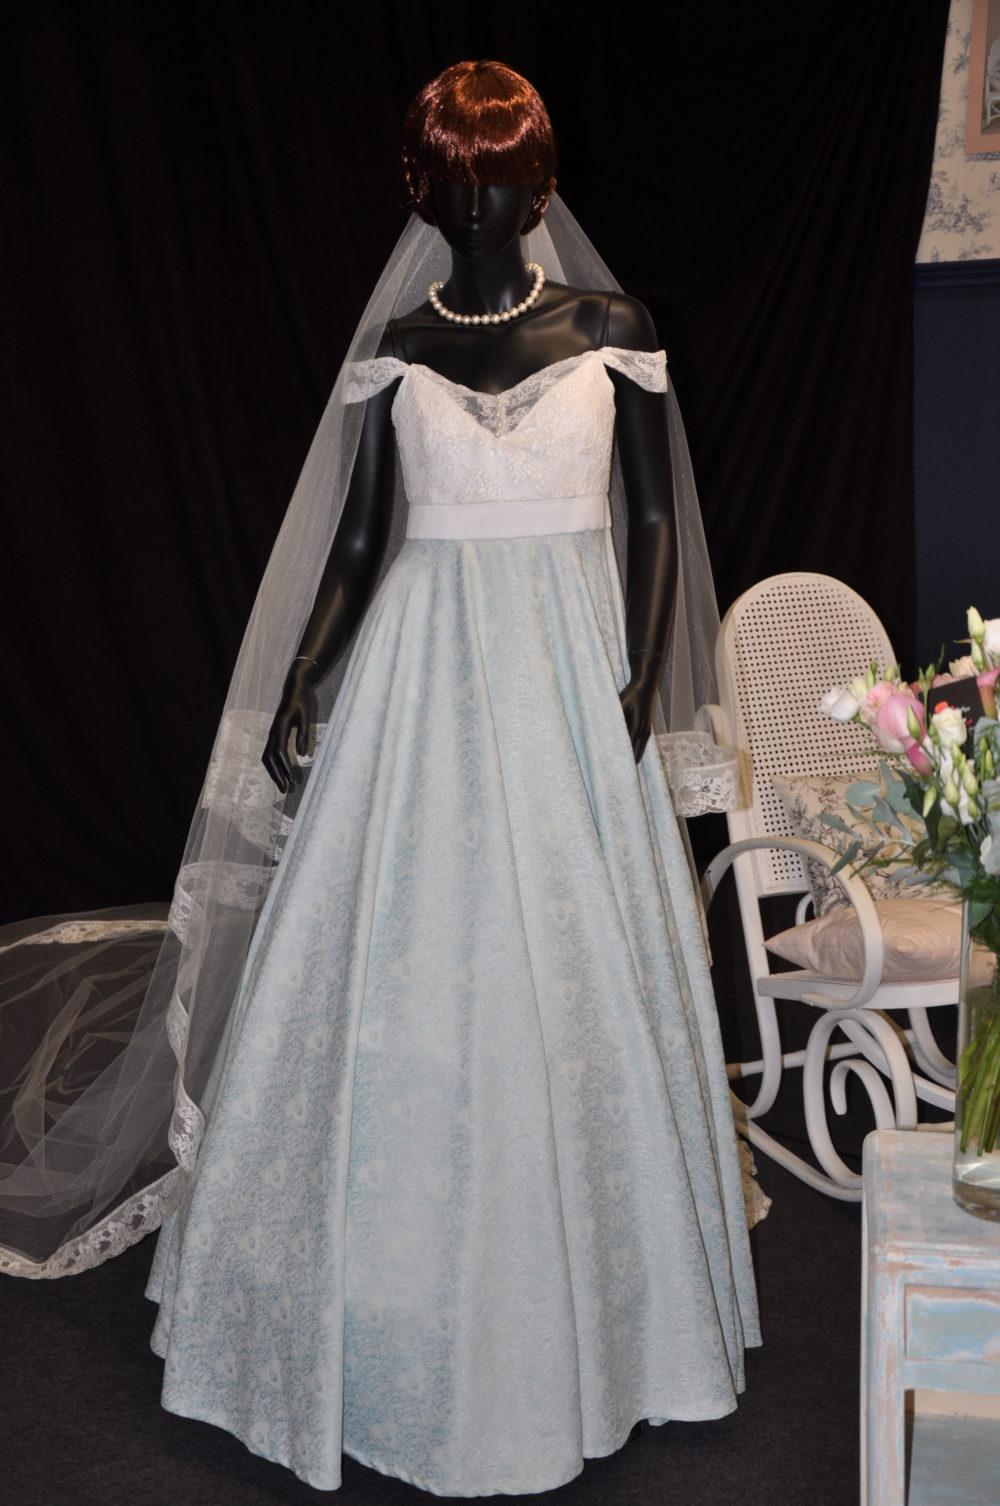 Robe de mariee a domicile 44